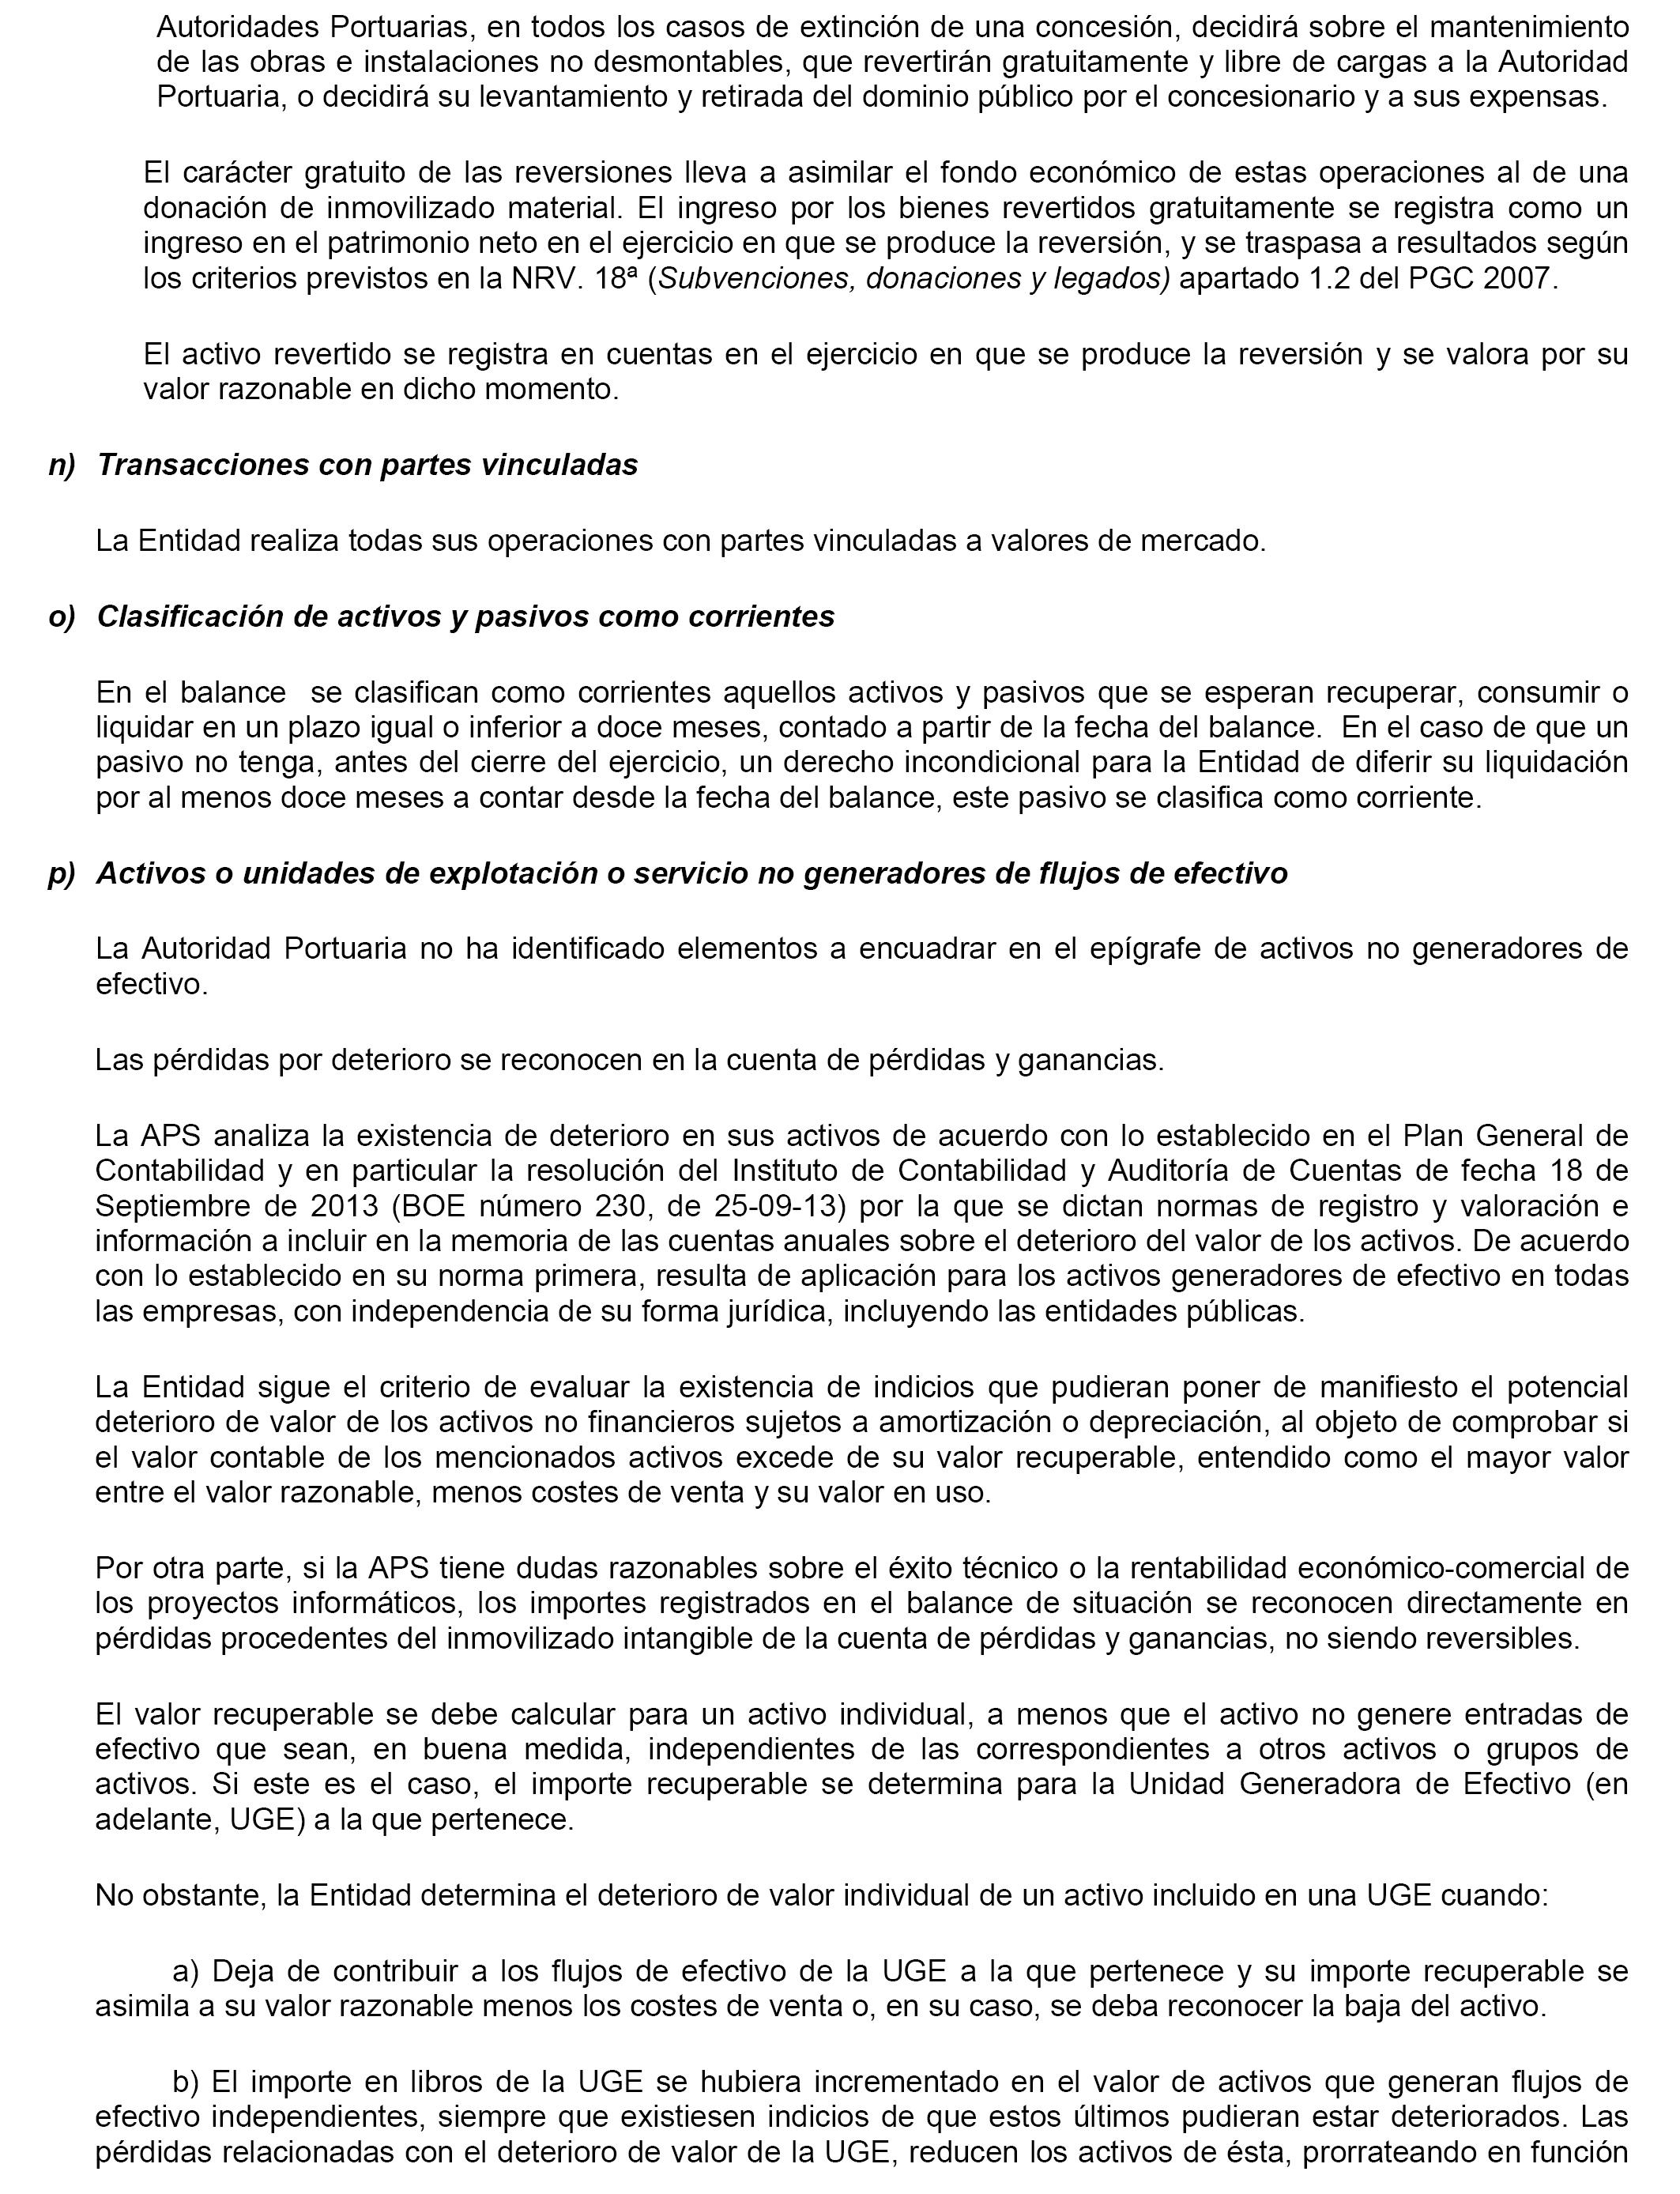 BOE.es - Documento BOE-A-2017-10233